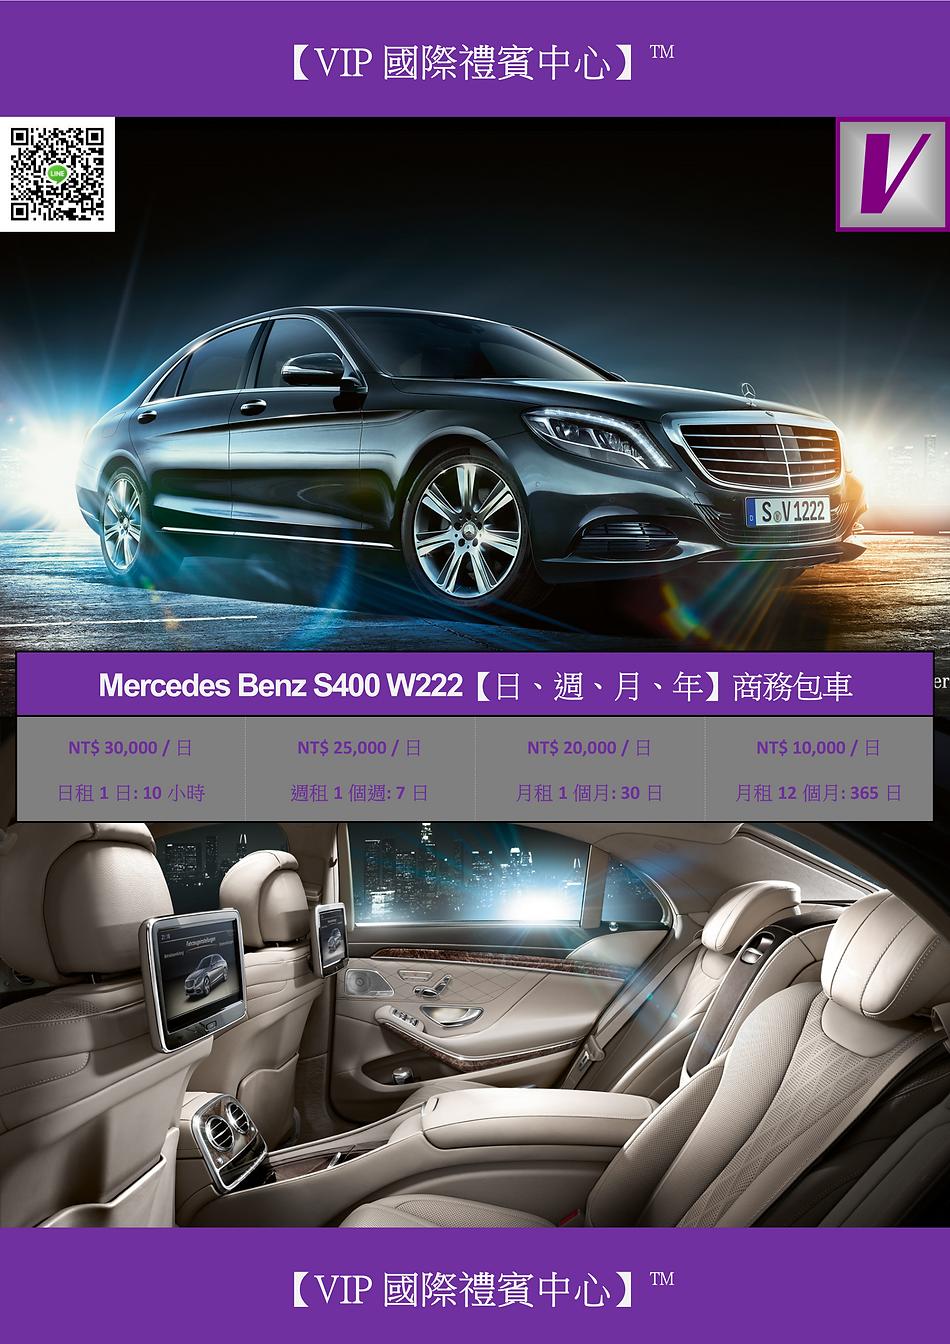 VIP國際禮賓中心 MERCEDES BENZ S400 W222 臺中市區接送包車